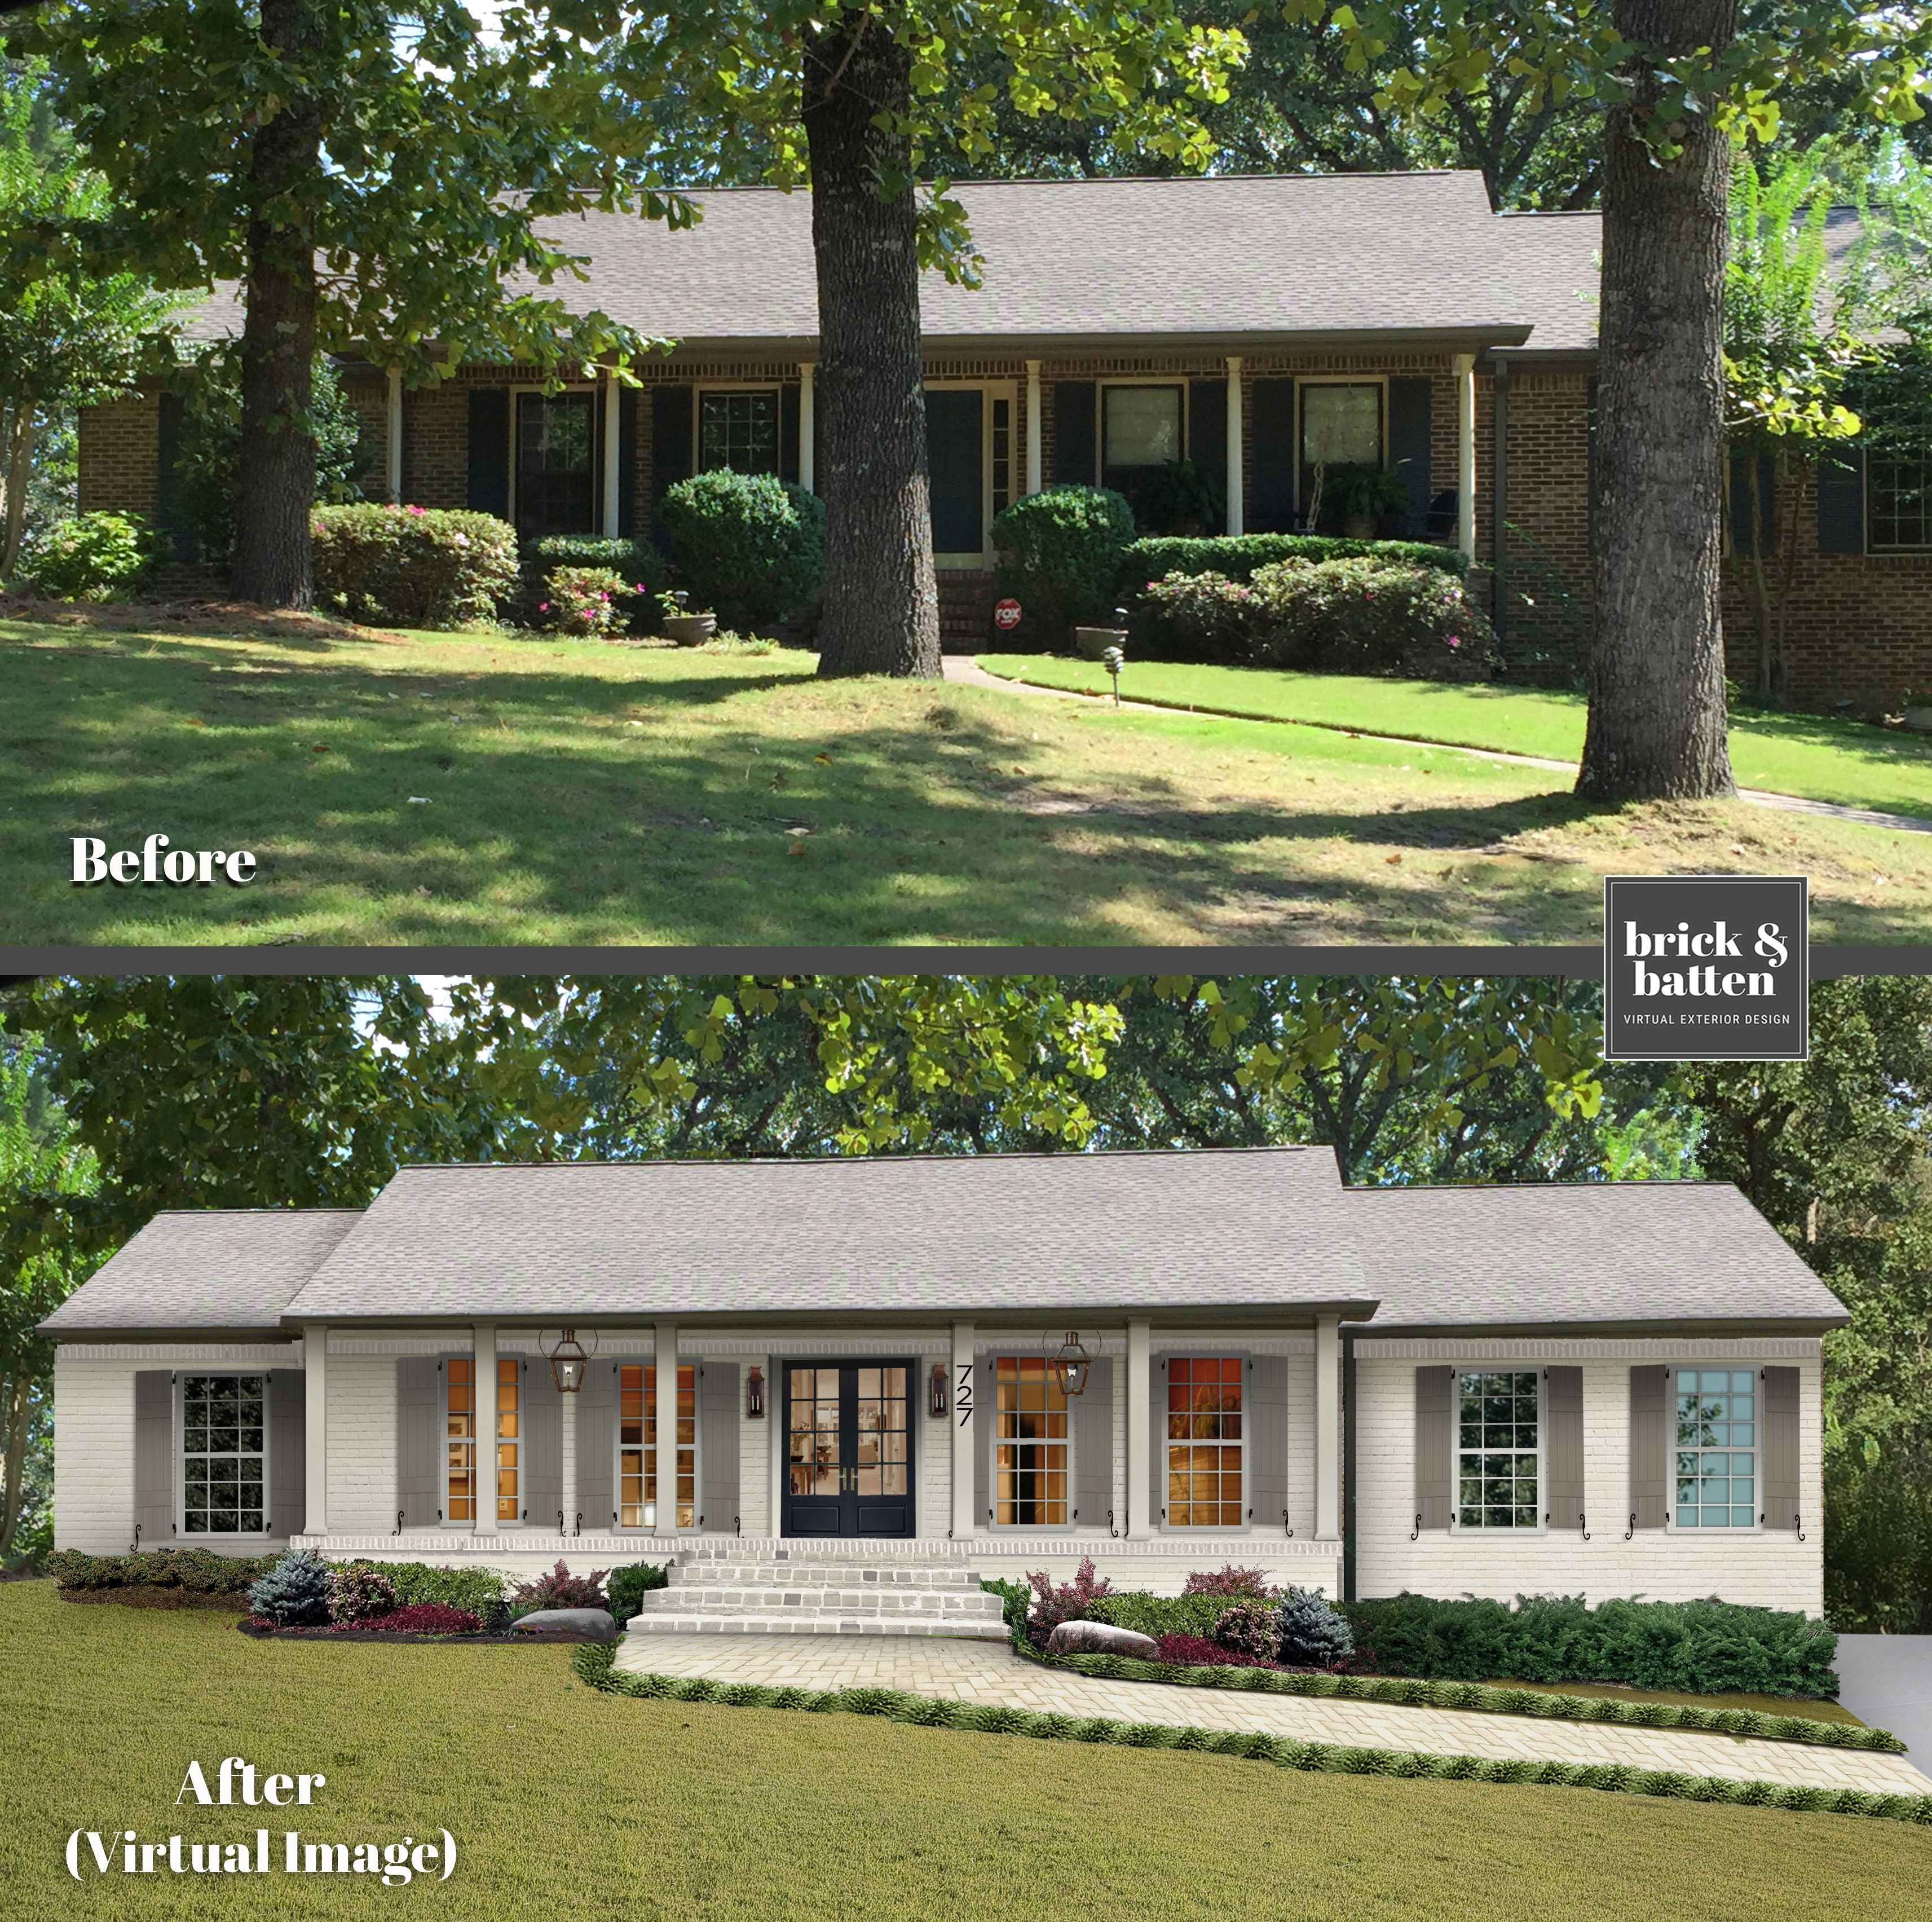 18 Predictions For 2020 Exterior Home Design Blog Brick Batten Brick Exterior House Painted Brick House Ranch House Exterior